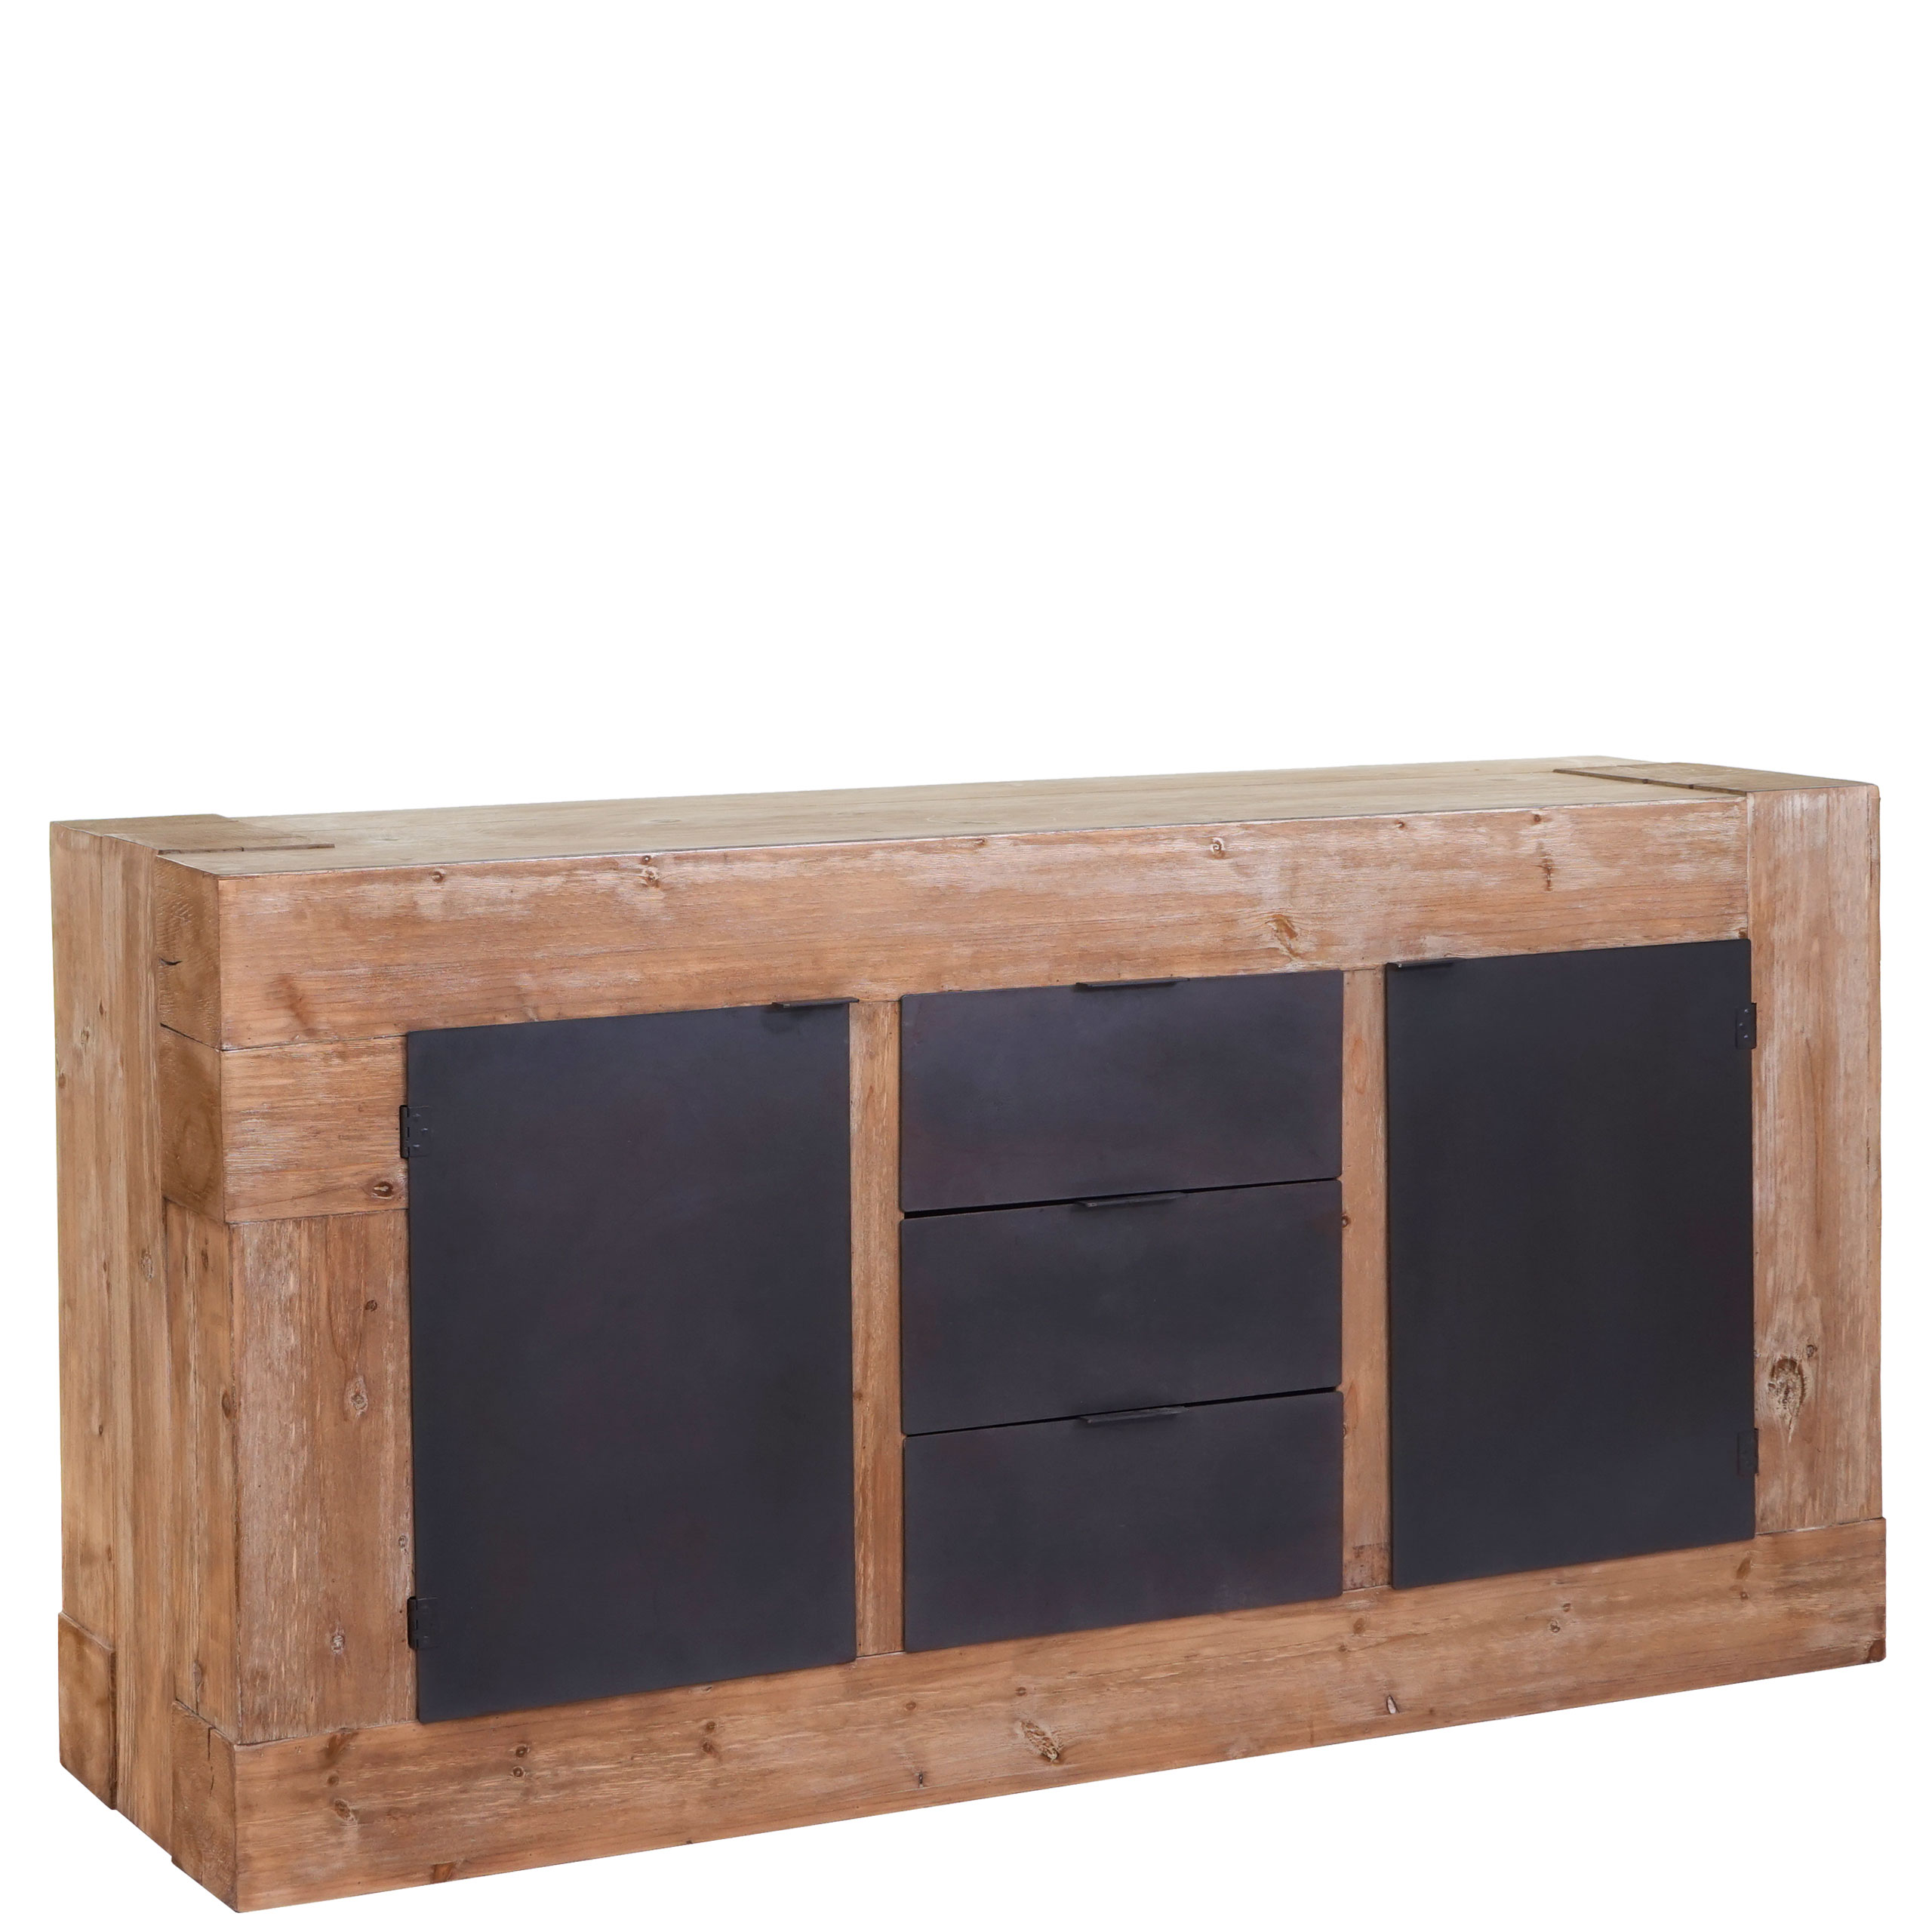 Sideboard Hwc A15 Kommode Schrank Anrichte Tanne Holz Rustikal